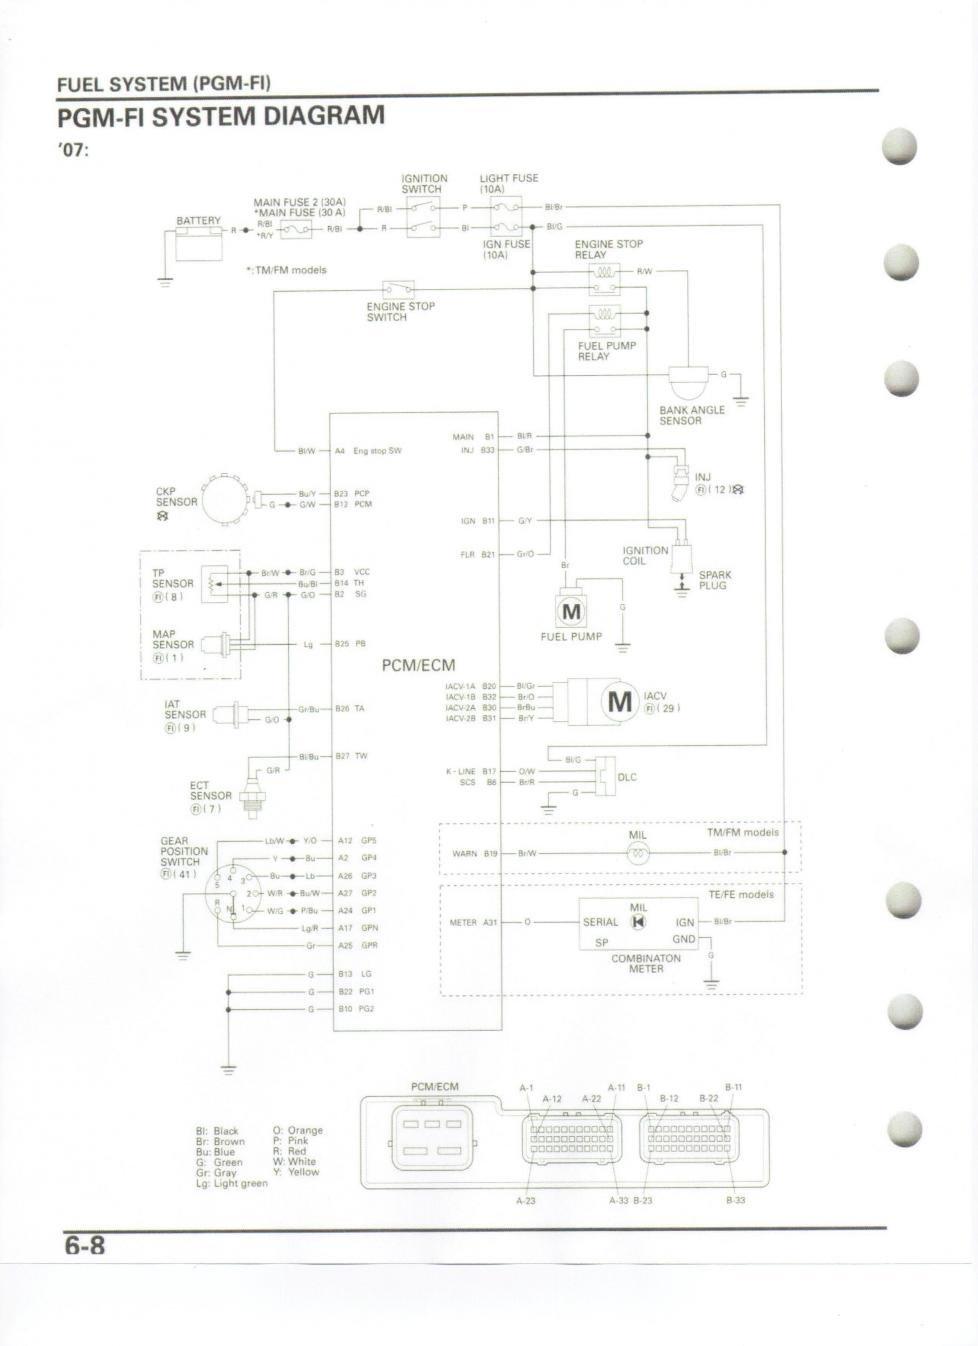 Ro 9775 2002 Honda 350 Rancher Wiring Diagram Free Diagram